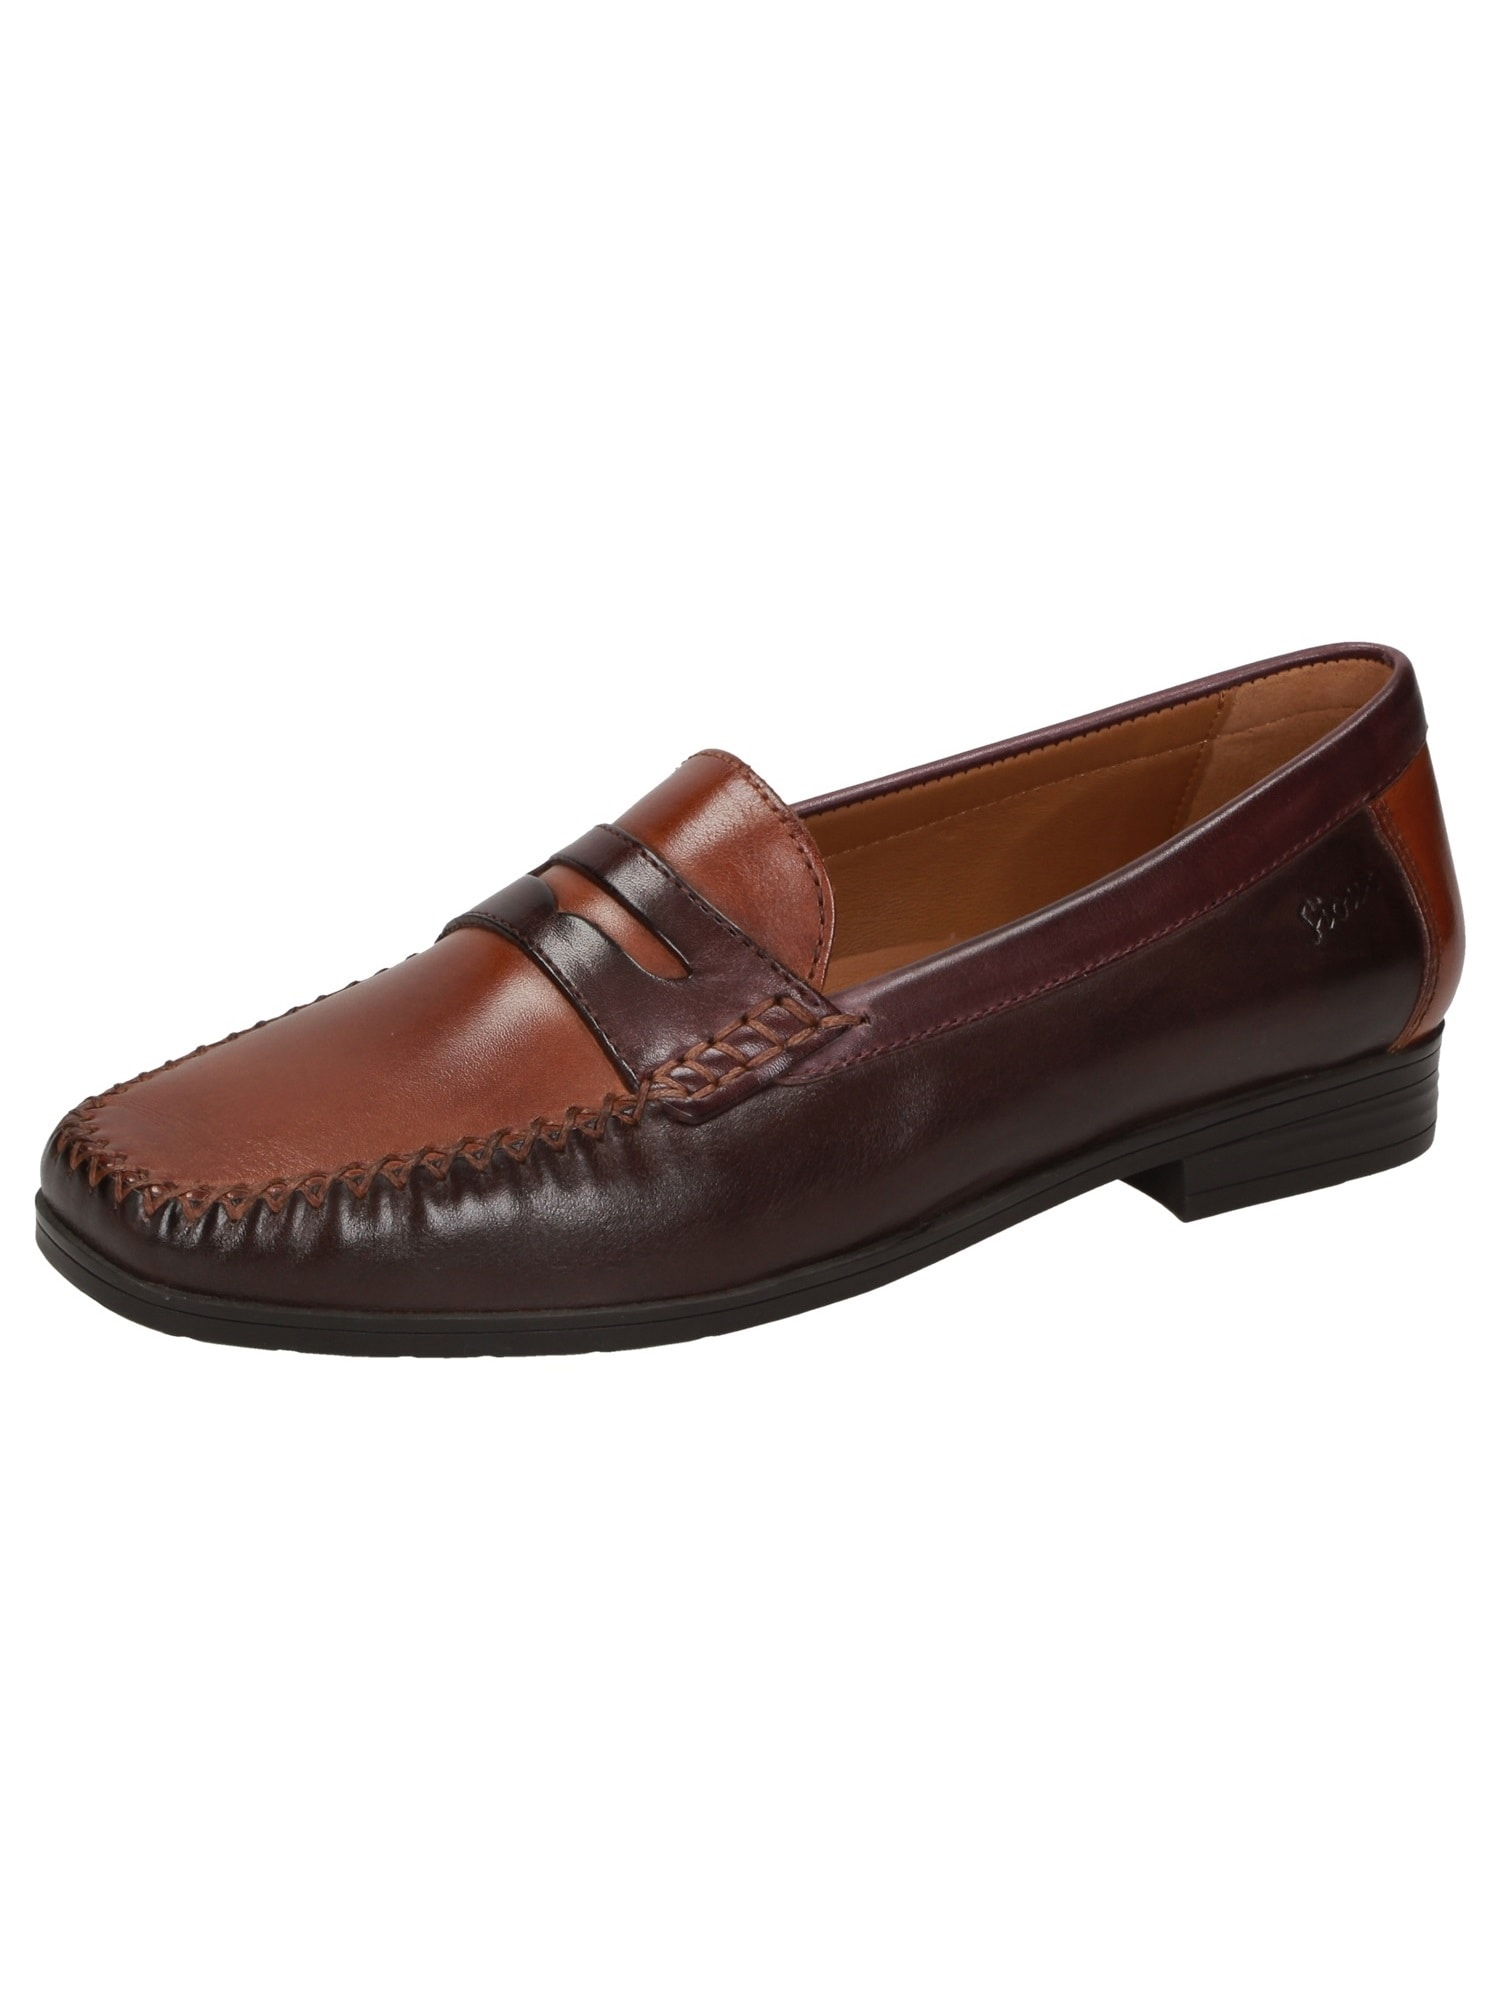 Mokassin 'Cortizia' | Schuhe > Mokassins | Braun | SIOUX